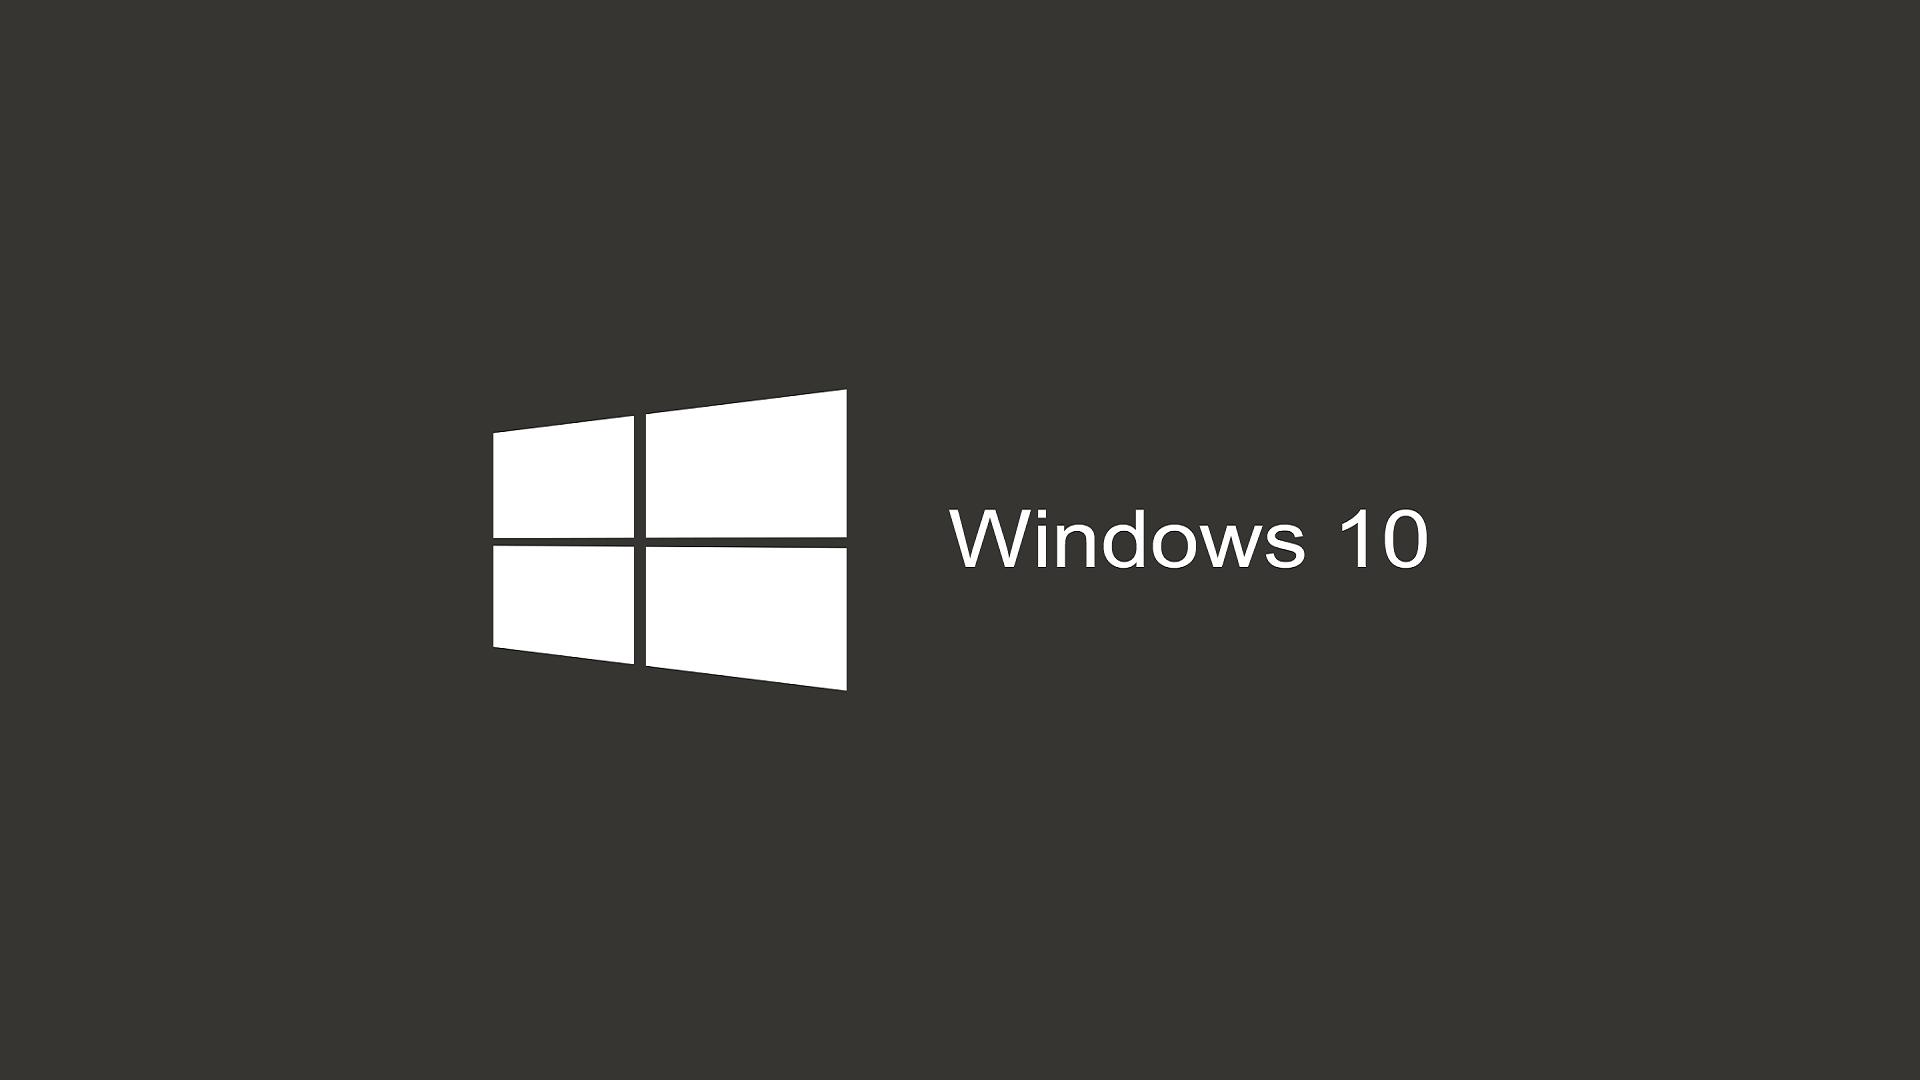 Windows 10 Wallpaper 1080p Full Hd White Logo Grey Background